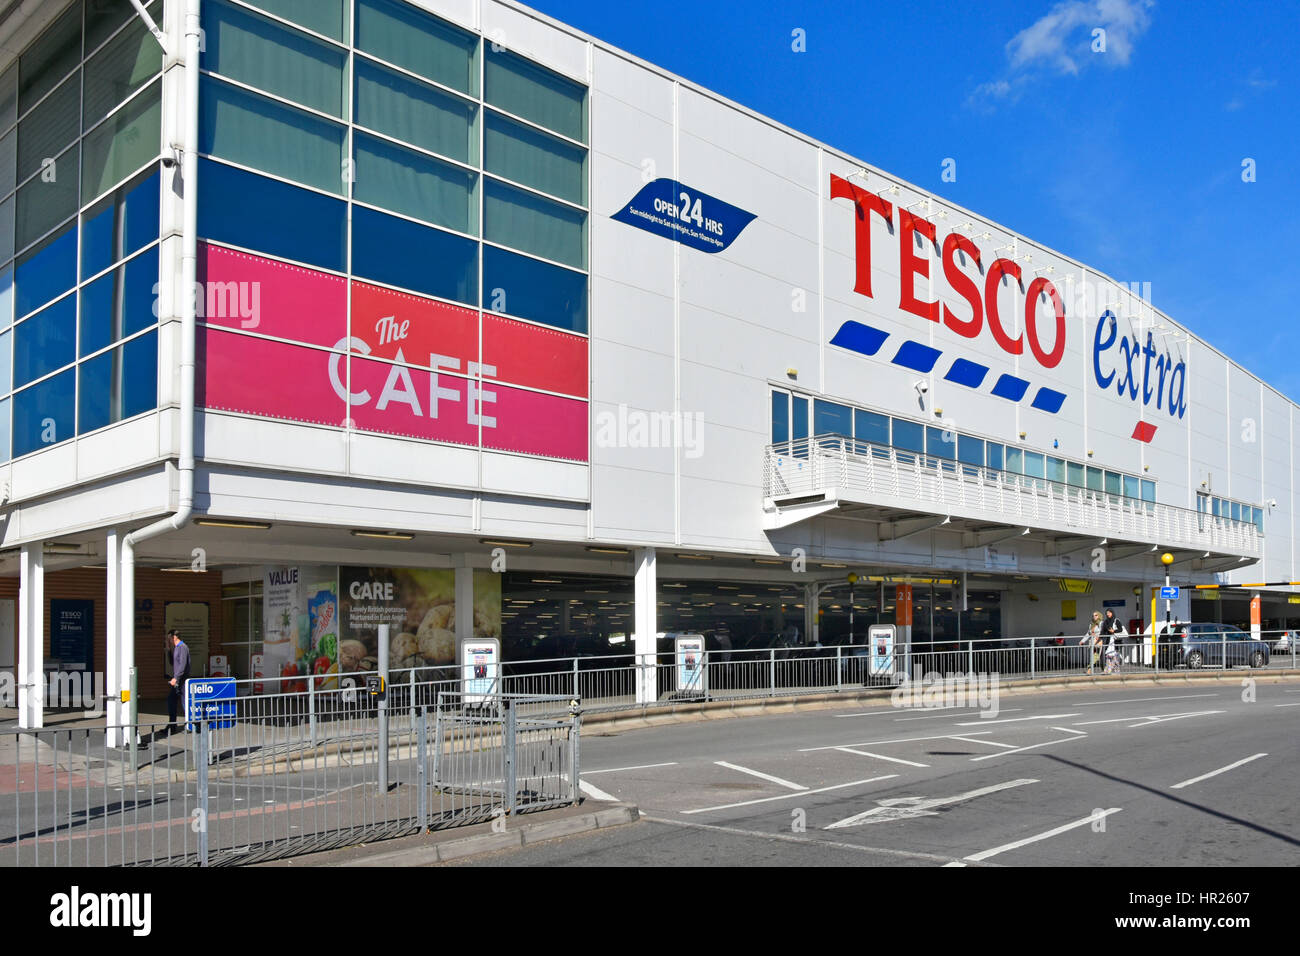 Bureau de change tesco amersham british shoppers are developing a